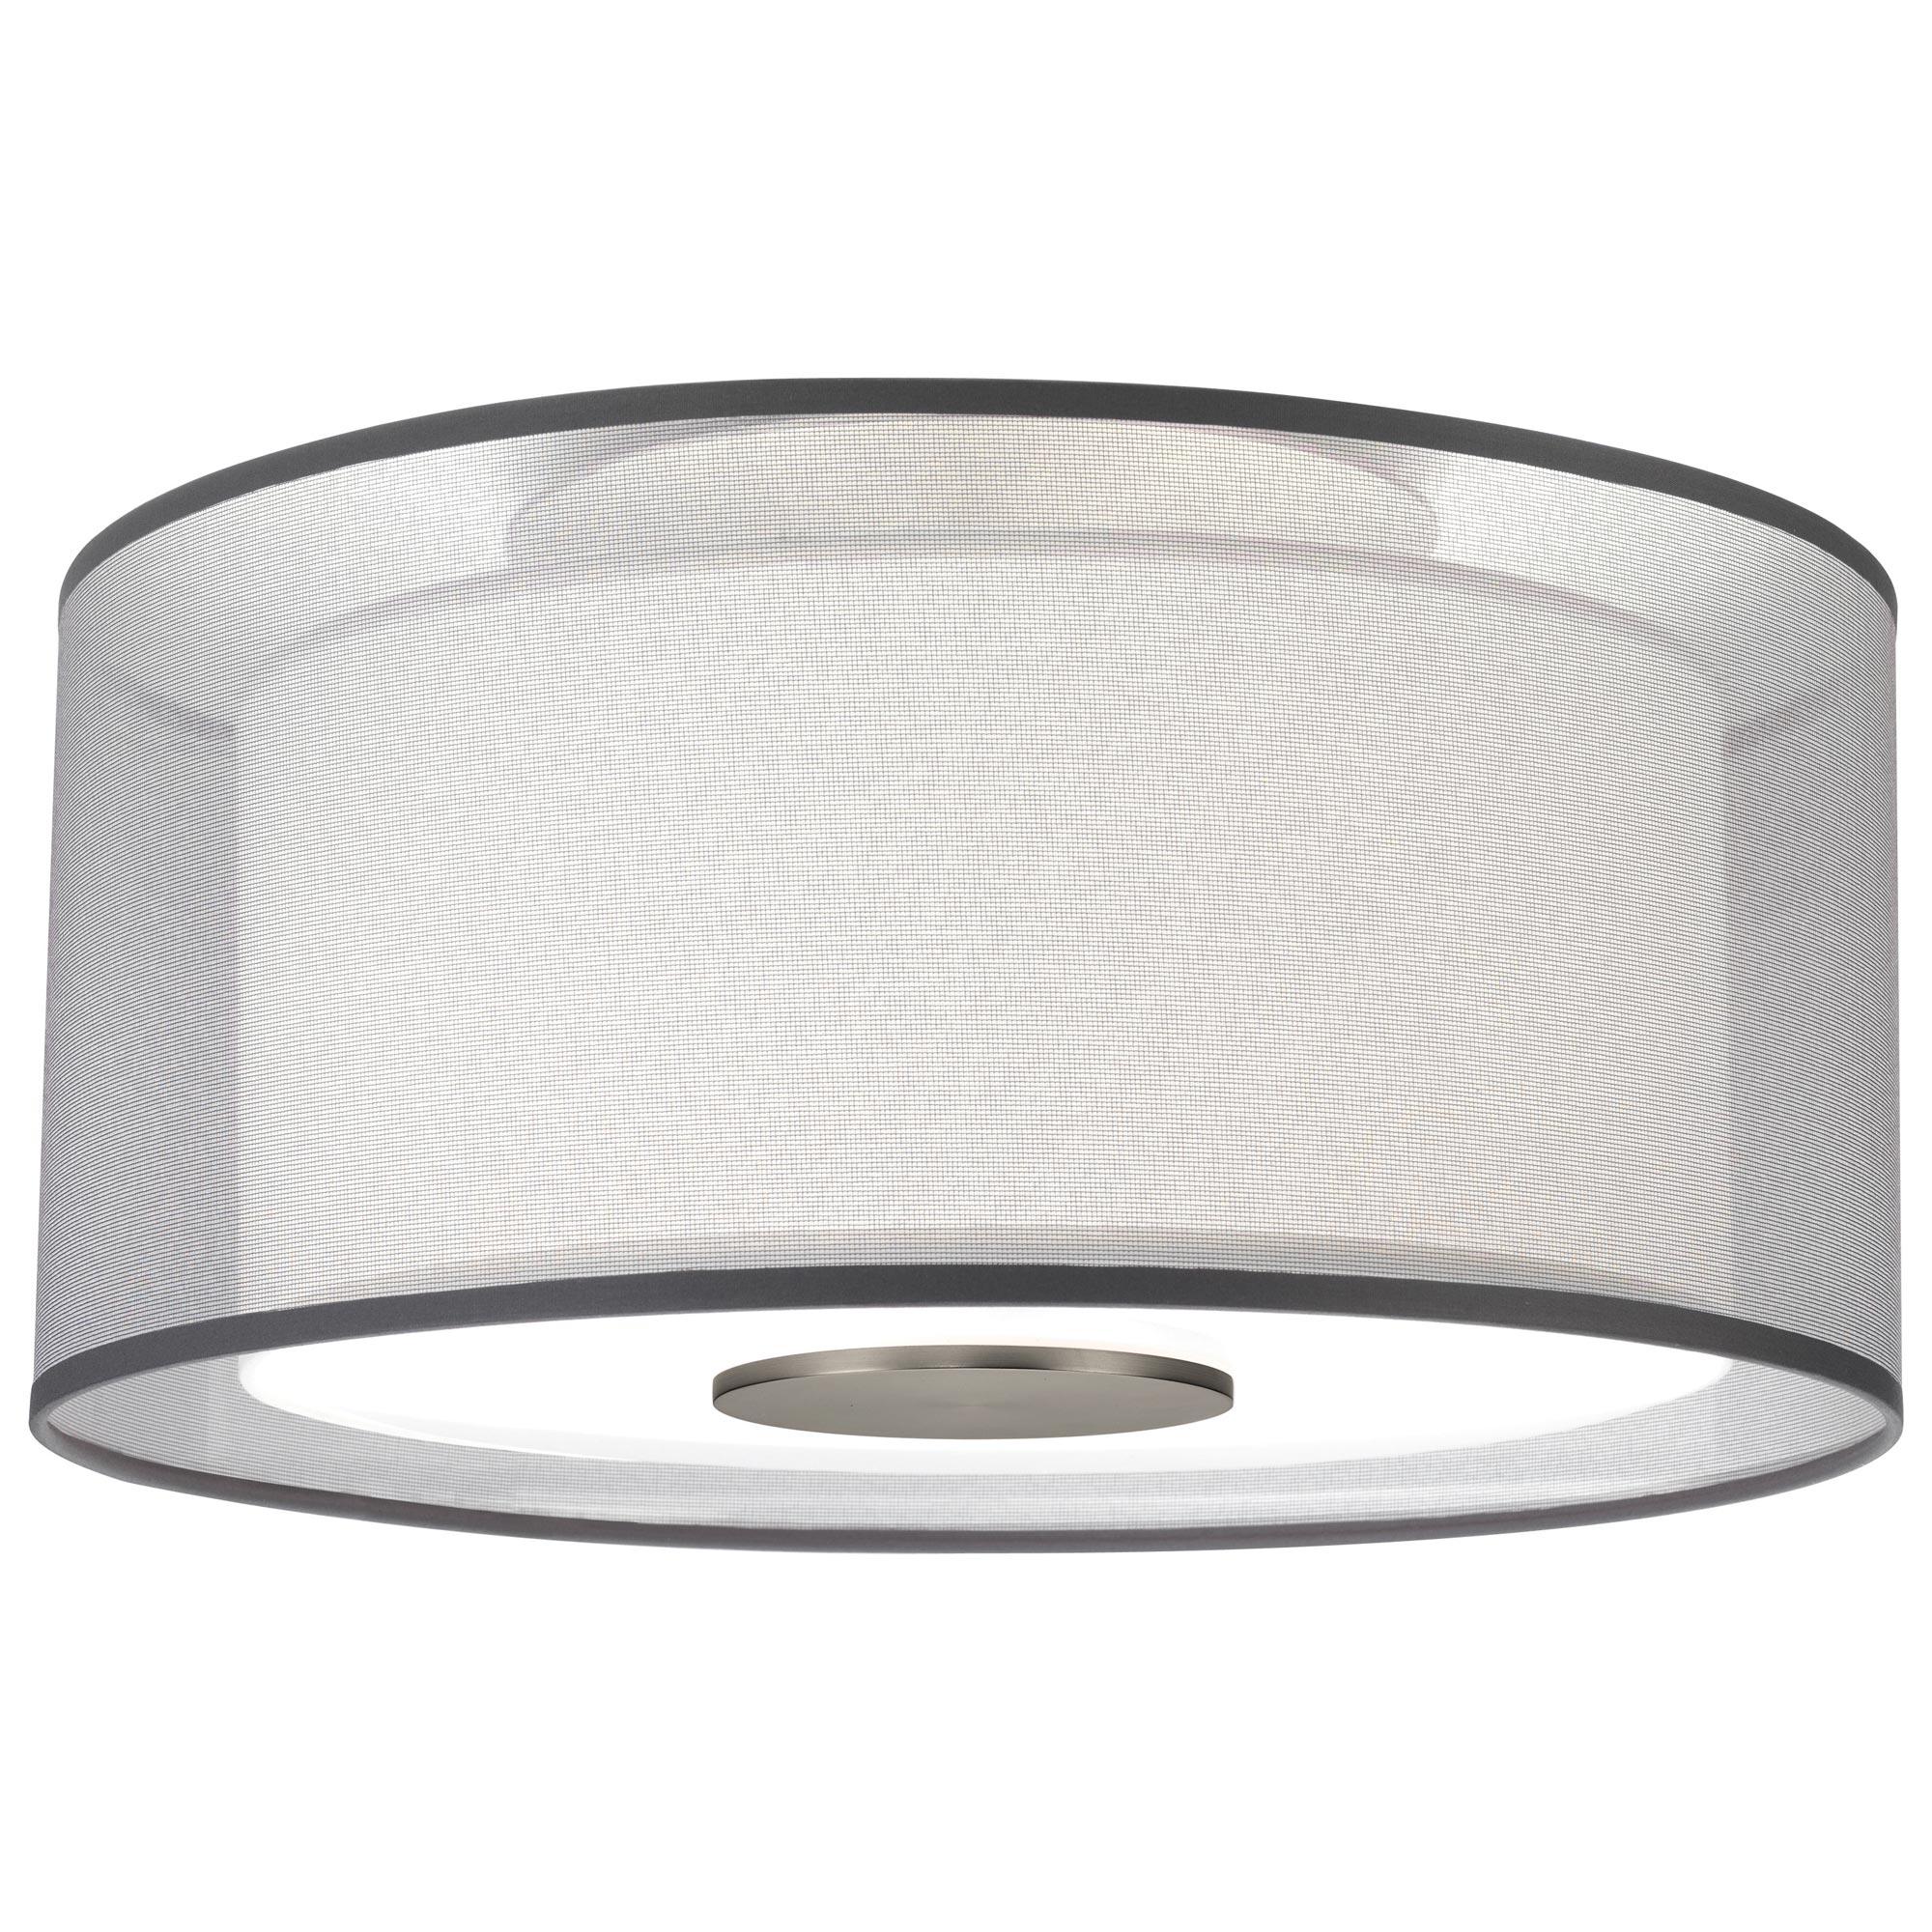 robert abbey lighting fixtures. simple fixtures saturnia semi flush ceiling mount by robert abbey  ras2197 inside lighting fixtures s